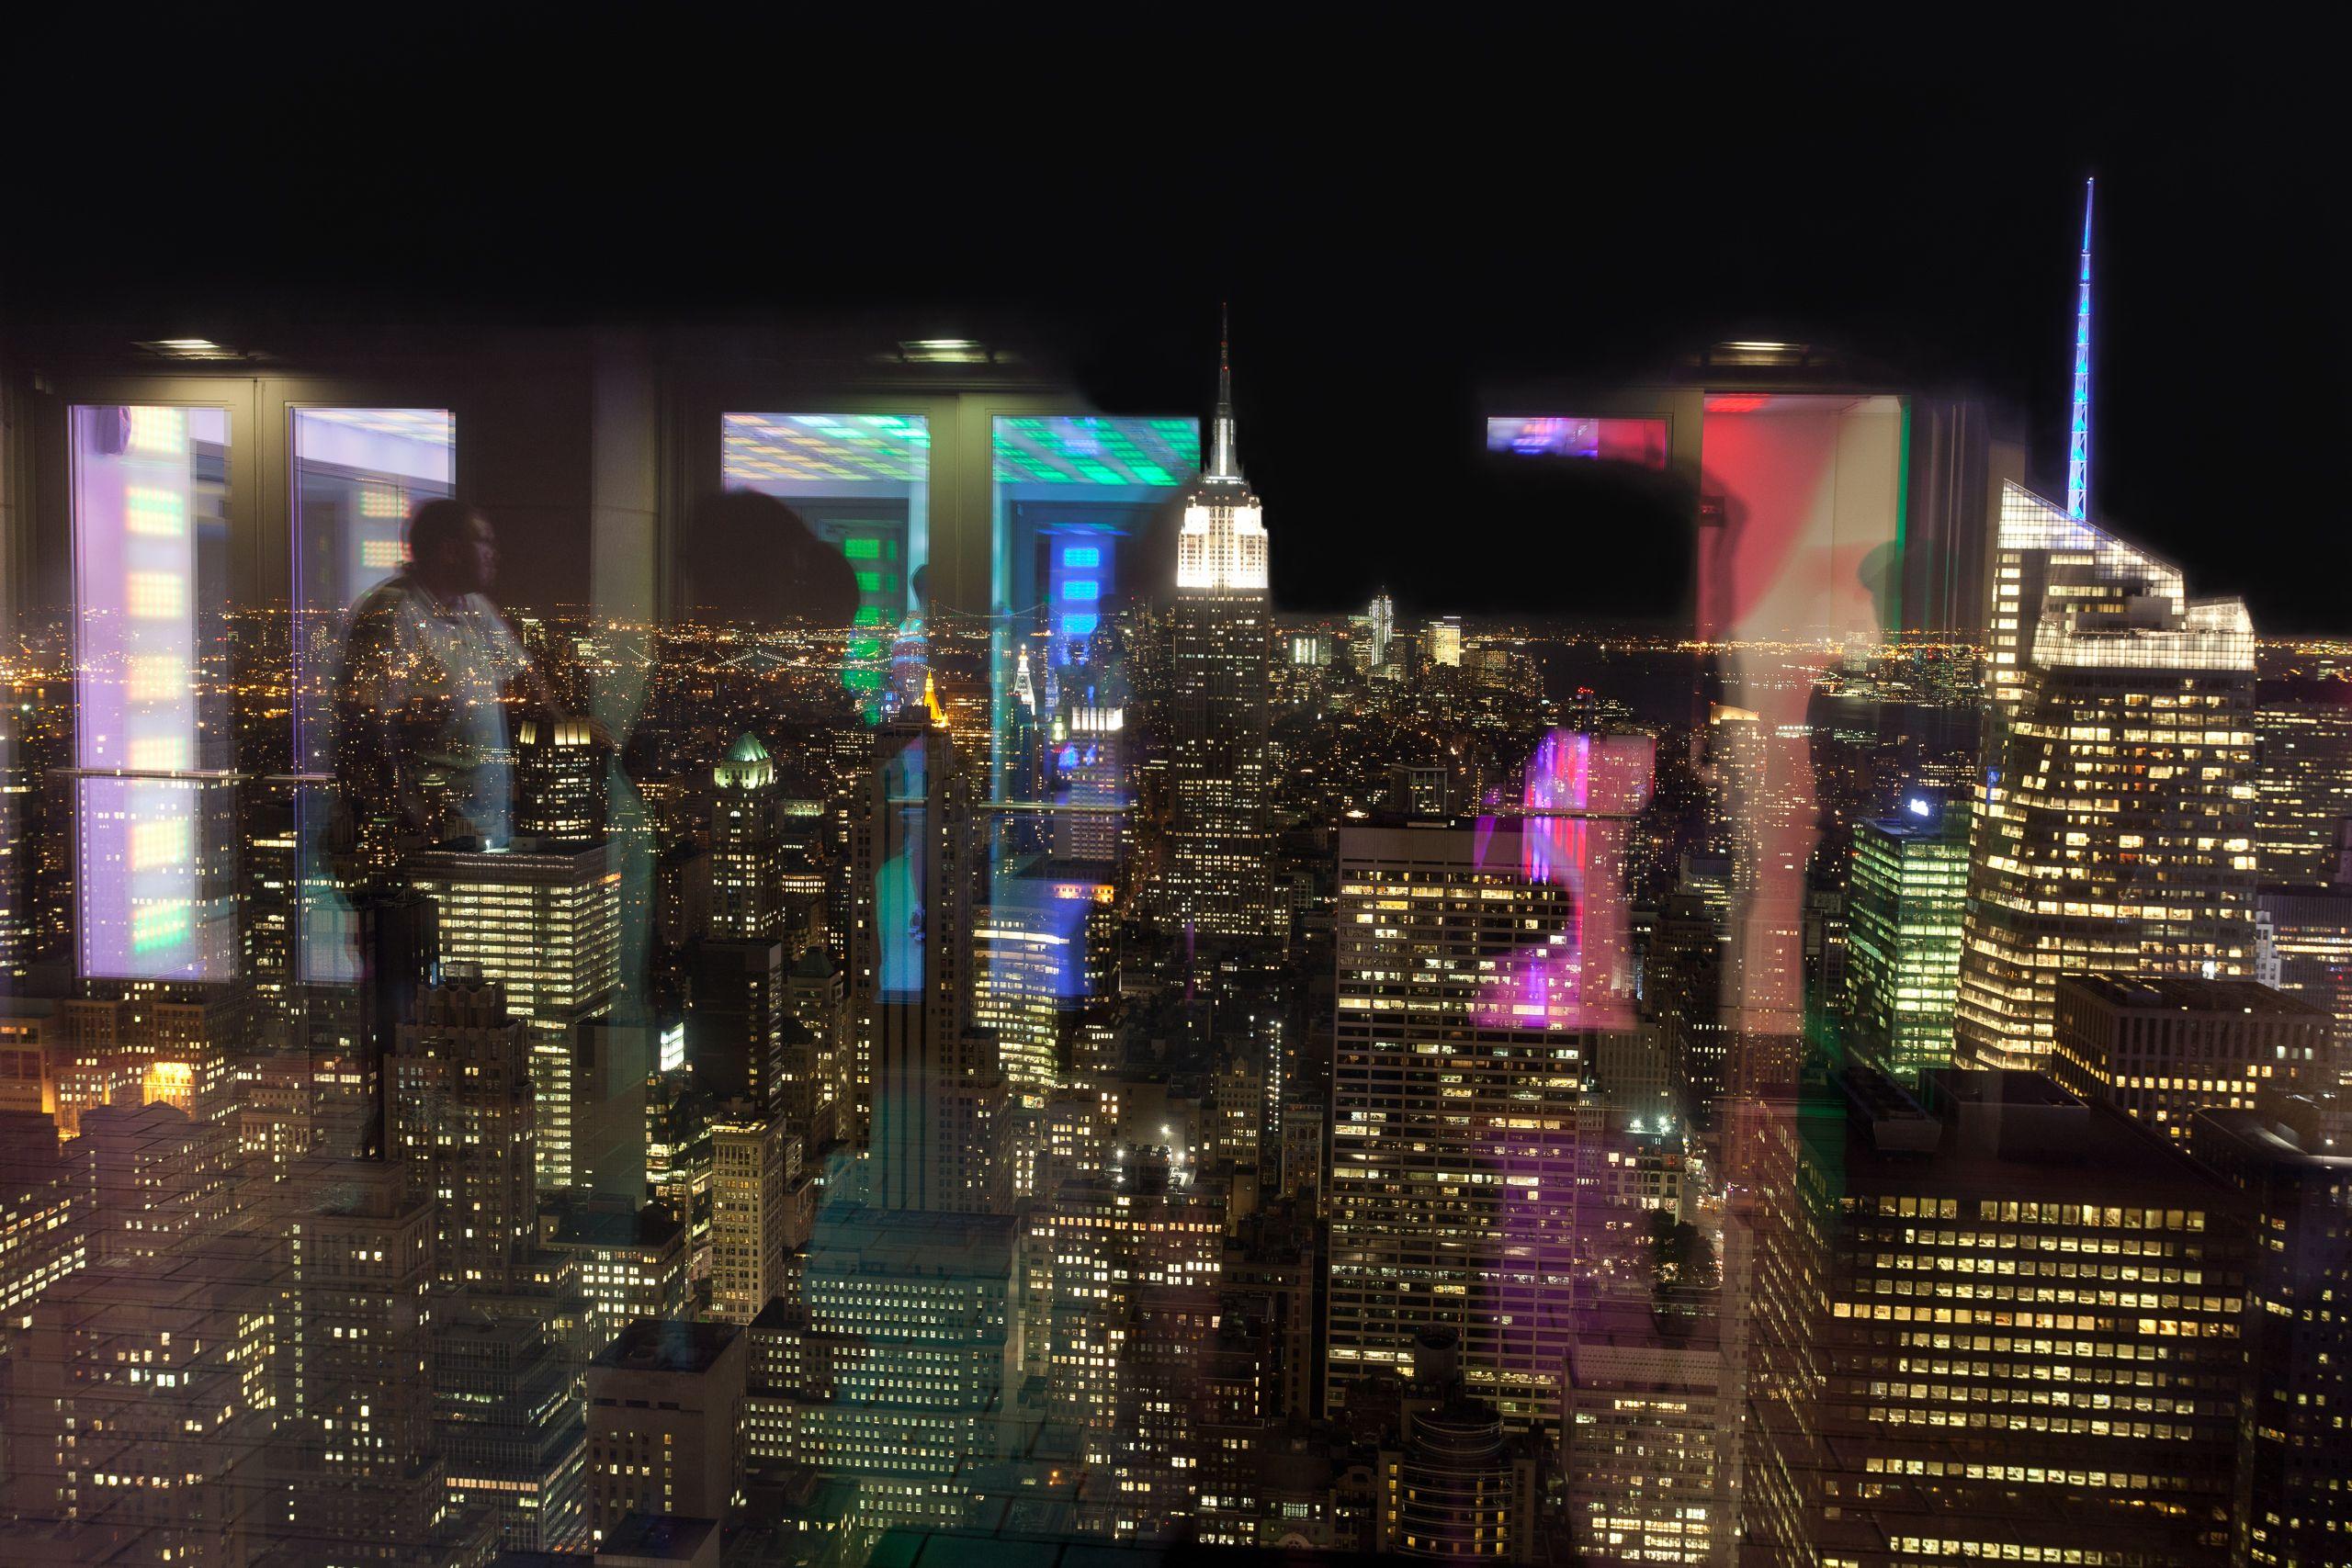 Top of the Rock. Rockefeller Center